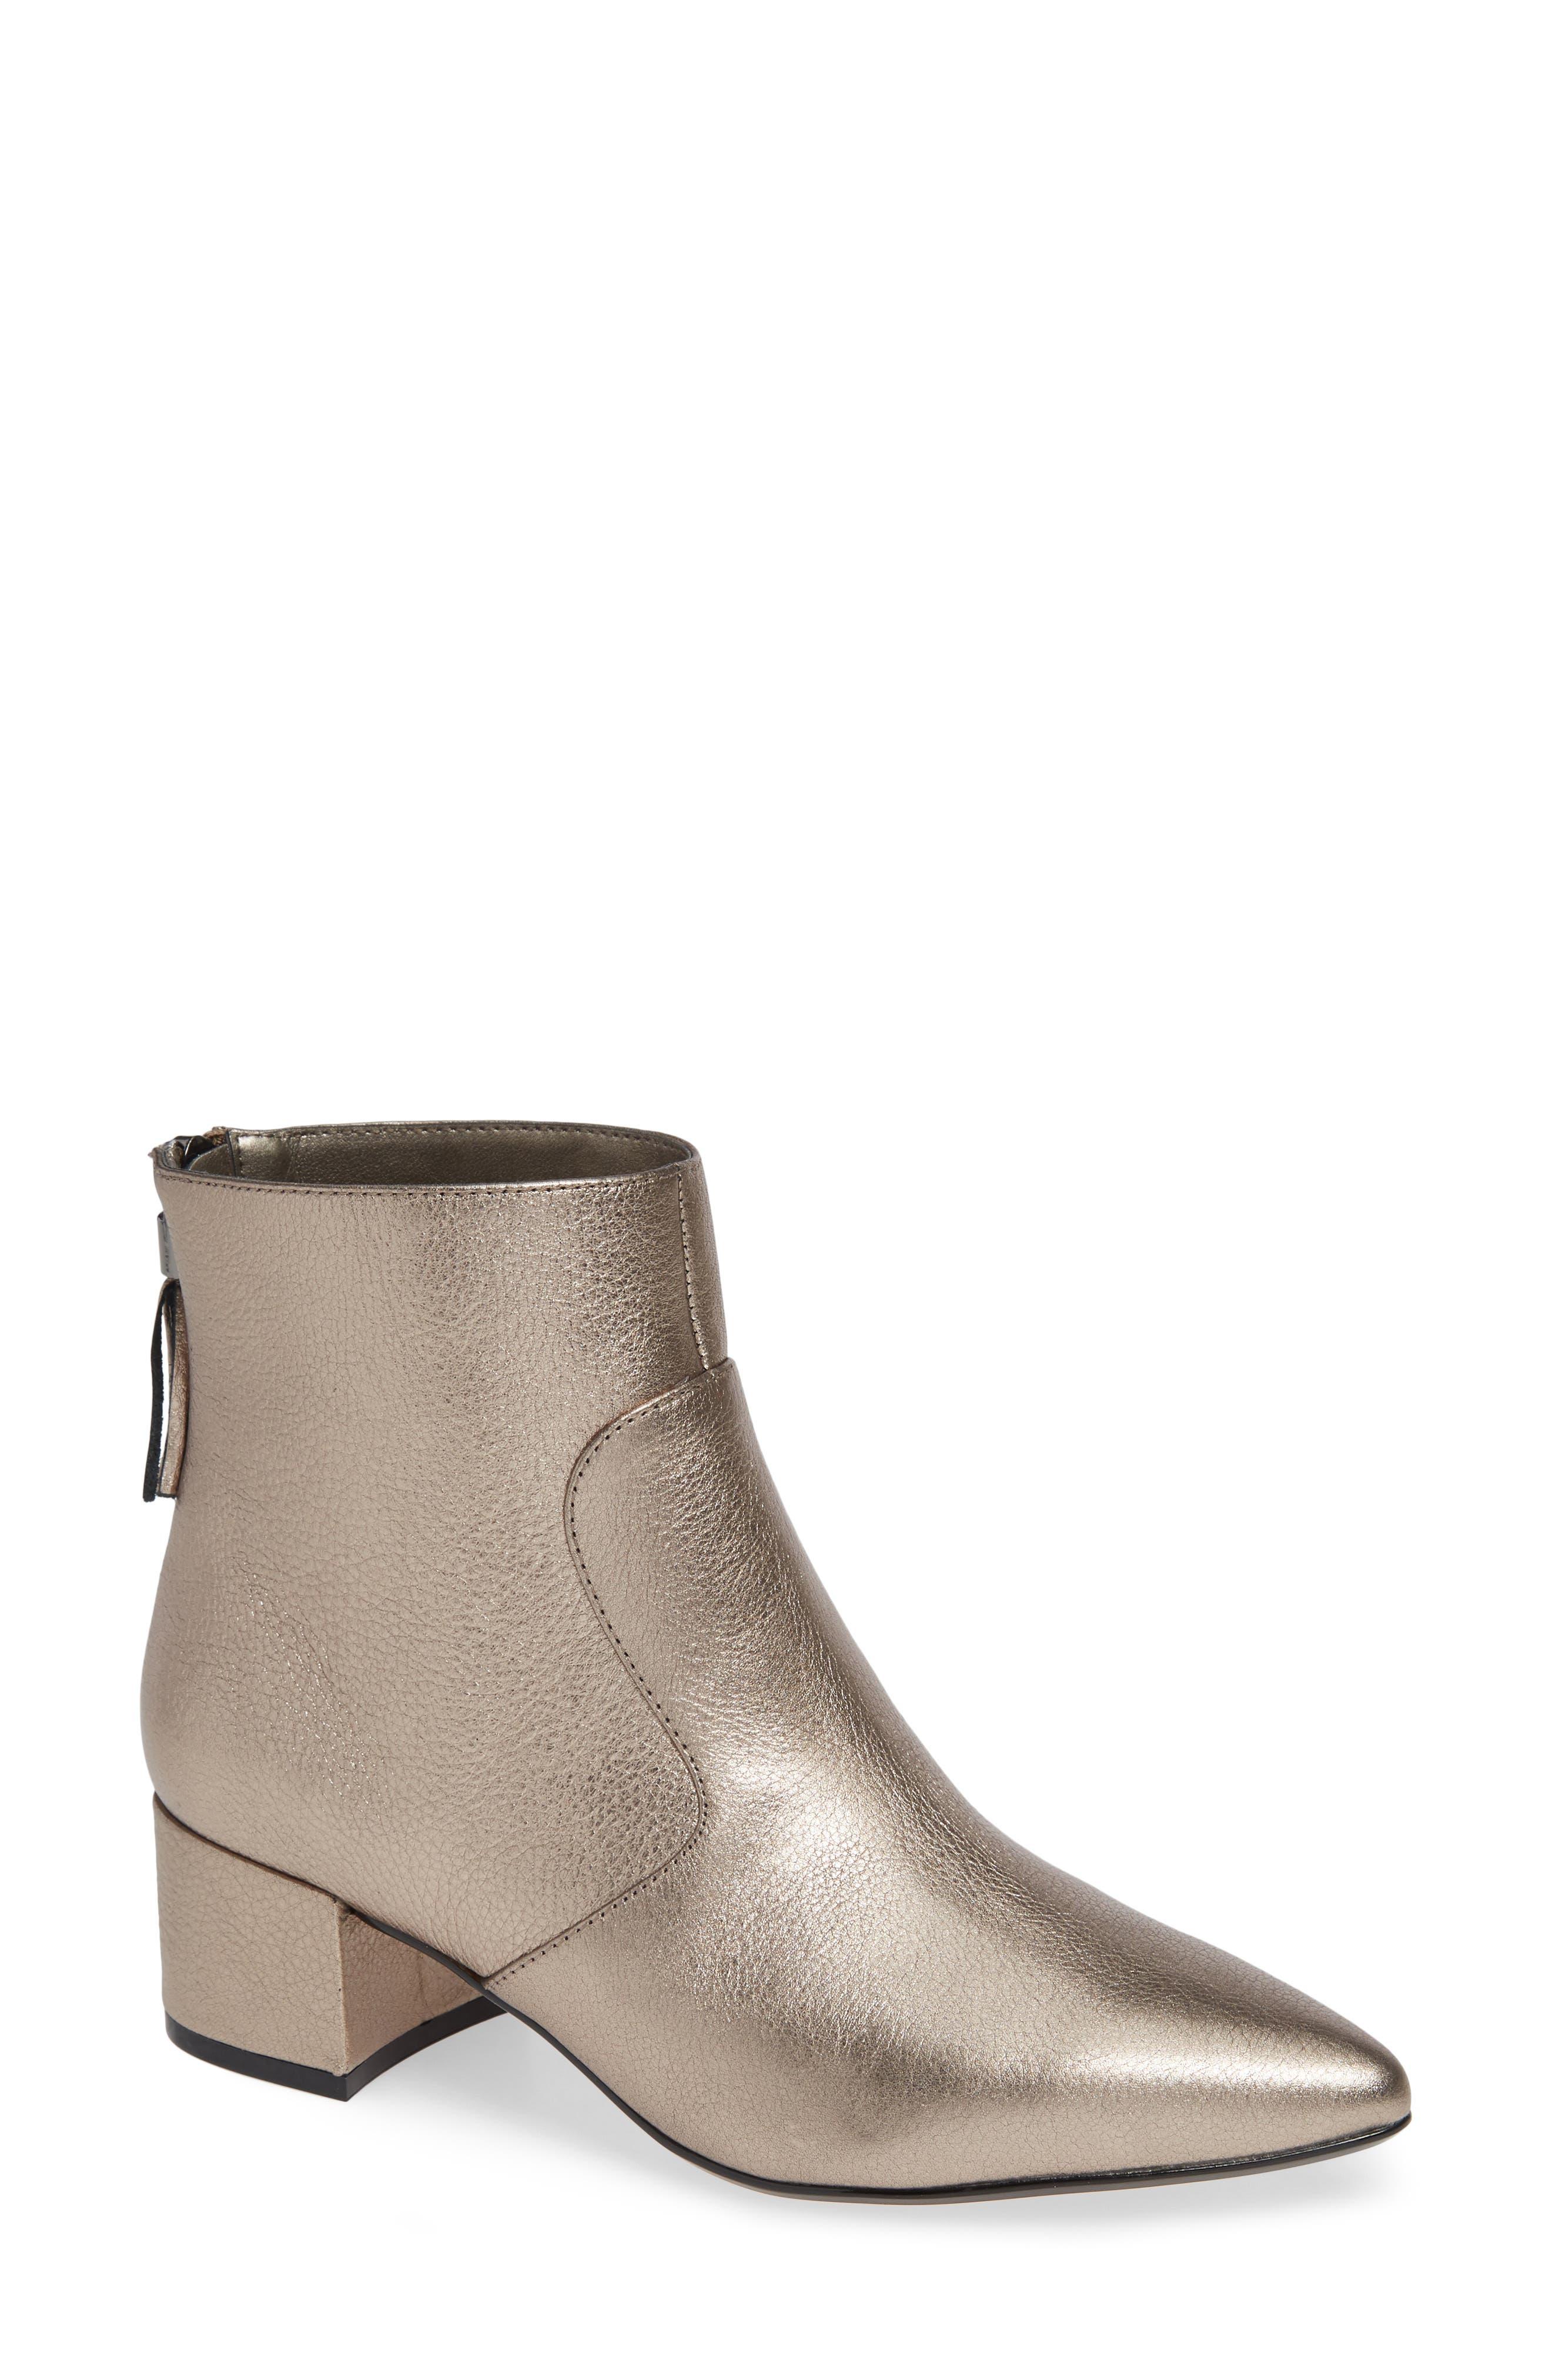 Karl Lagerfeld Paris Maude Boot, Grey